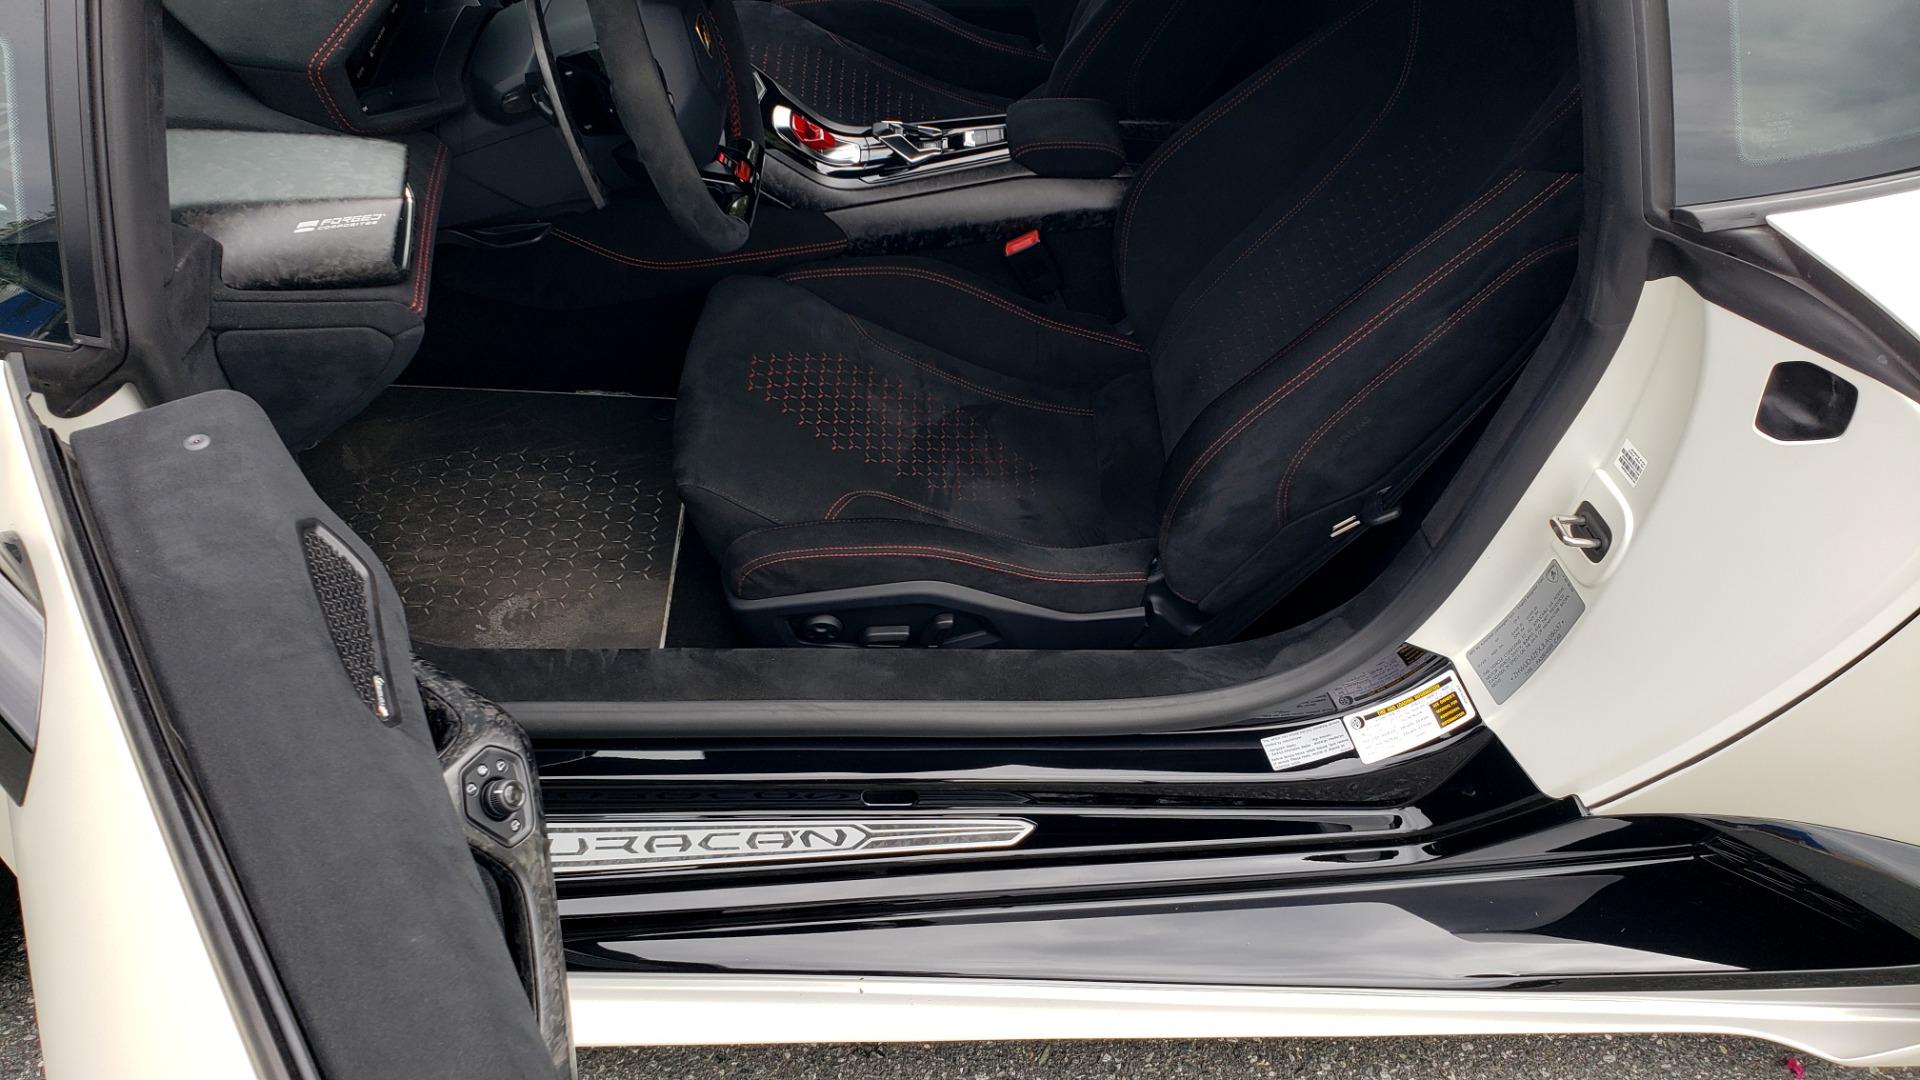 Used 2018 Lamborghini HURACAN PERFORMANTE 5.2L V10 / 630HP / 7-SPD AUTO / AWD / NAV / PREM SND for sale $269,995 at Formula Imports in Charlotte NC 28227 59